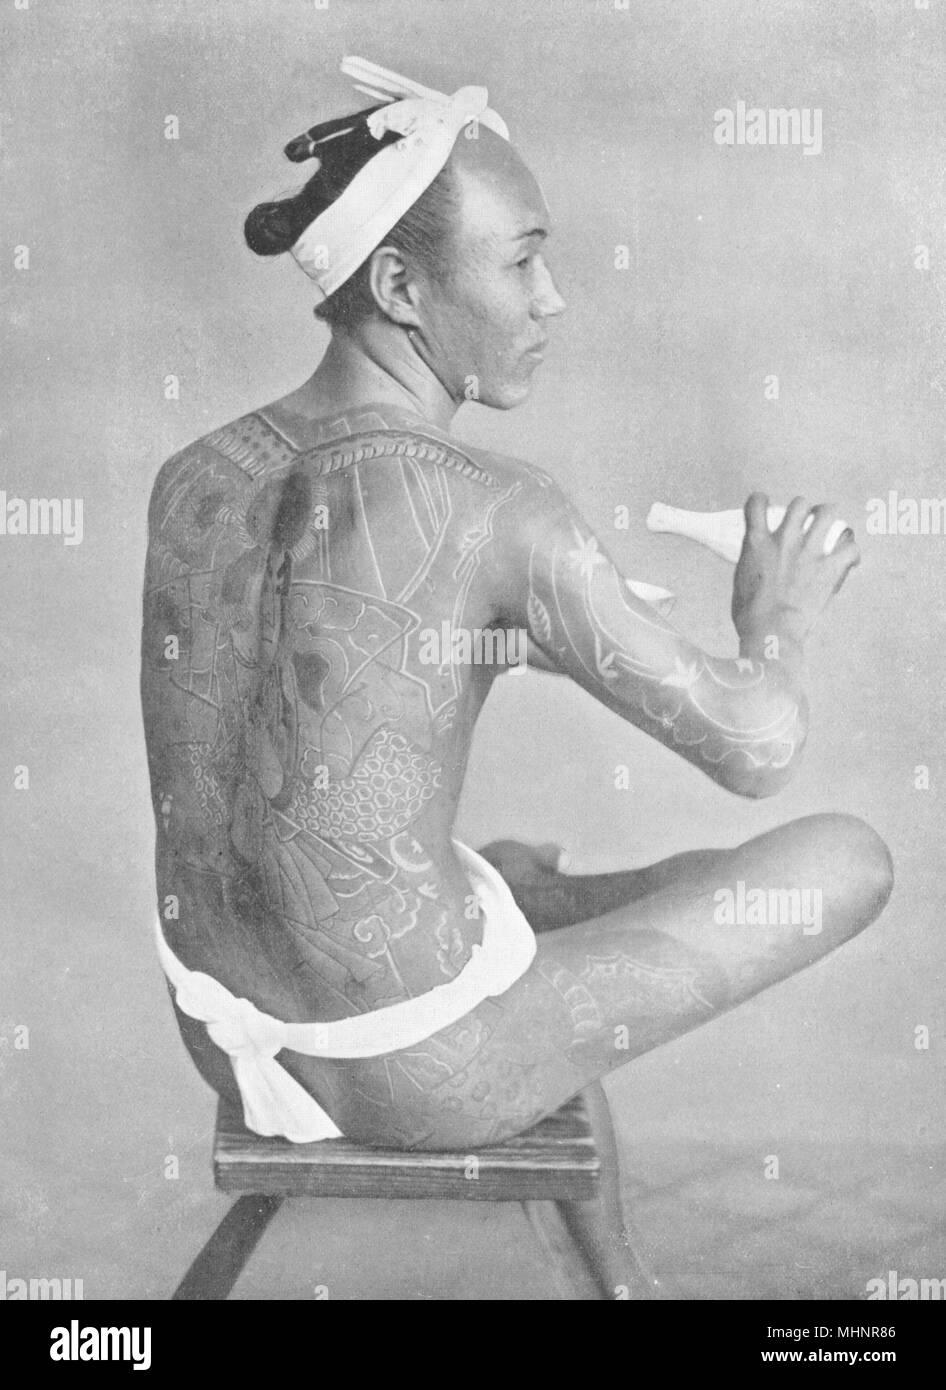 JAPAN. Japan. Tattooing, Japan; mark of low breeding and vulgarity in Japan 1900 - Stock Image